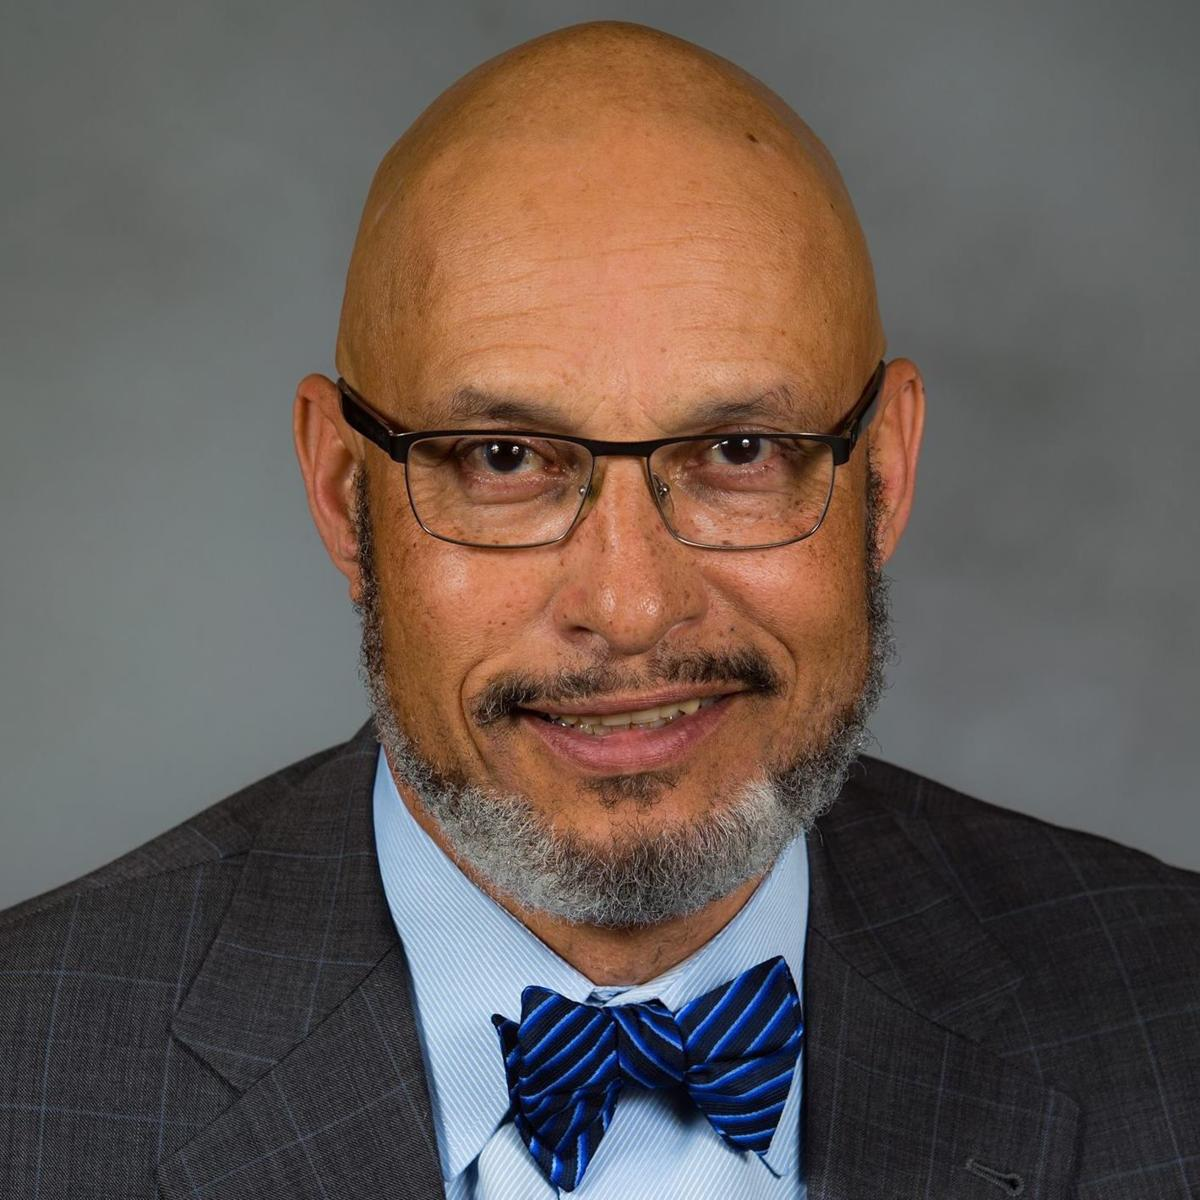 Dennis J. Shields